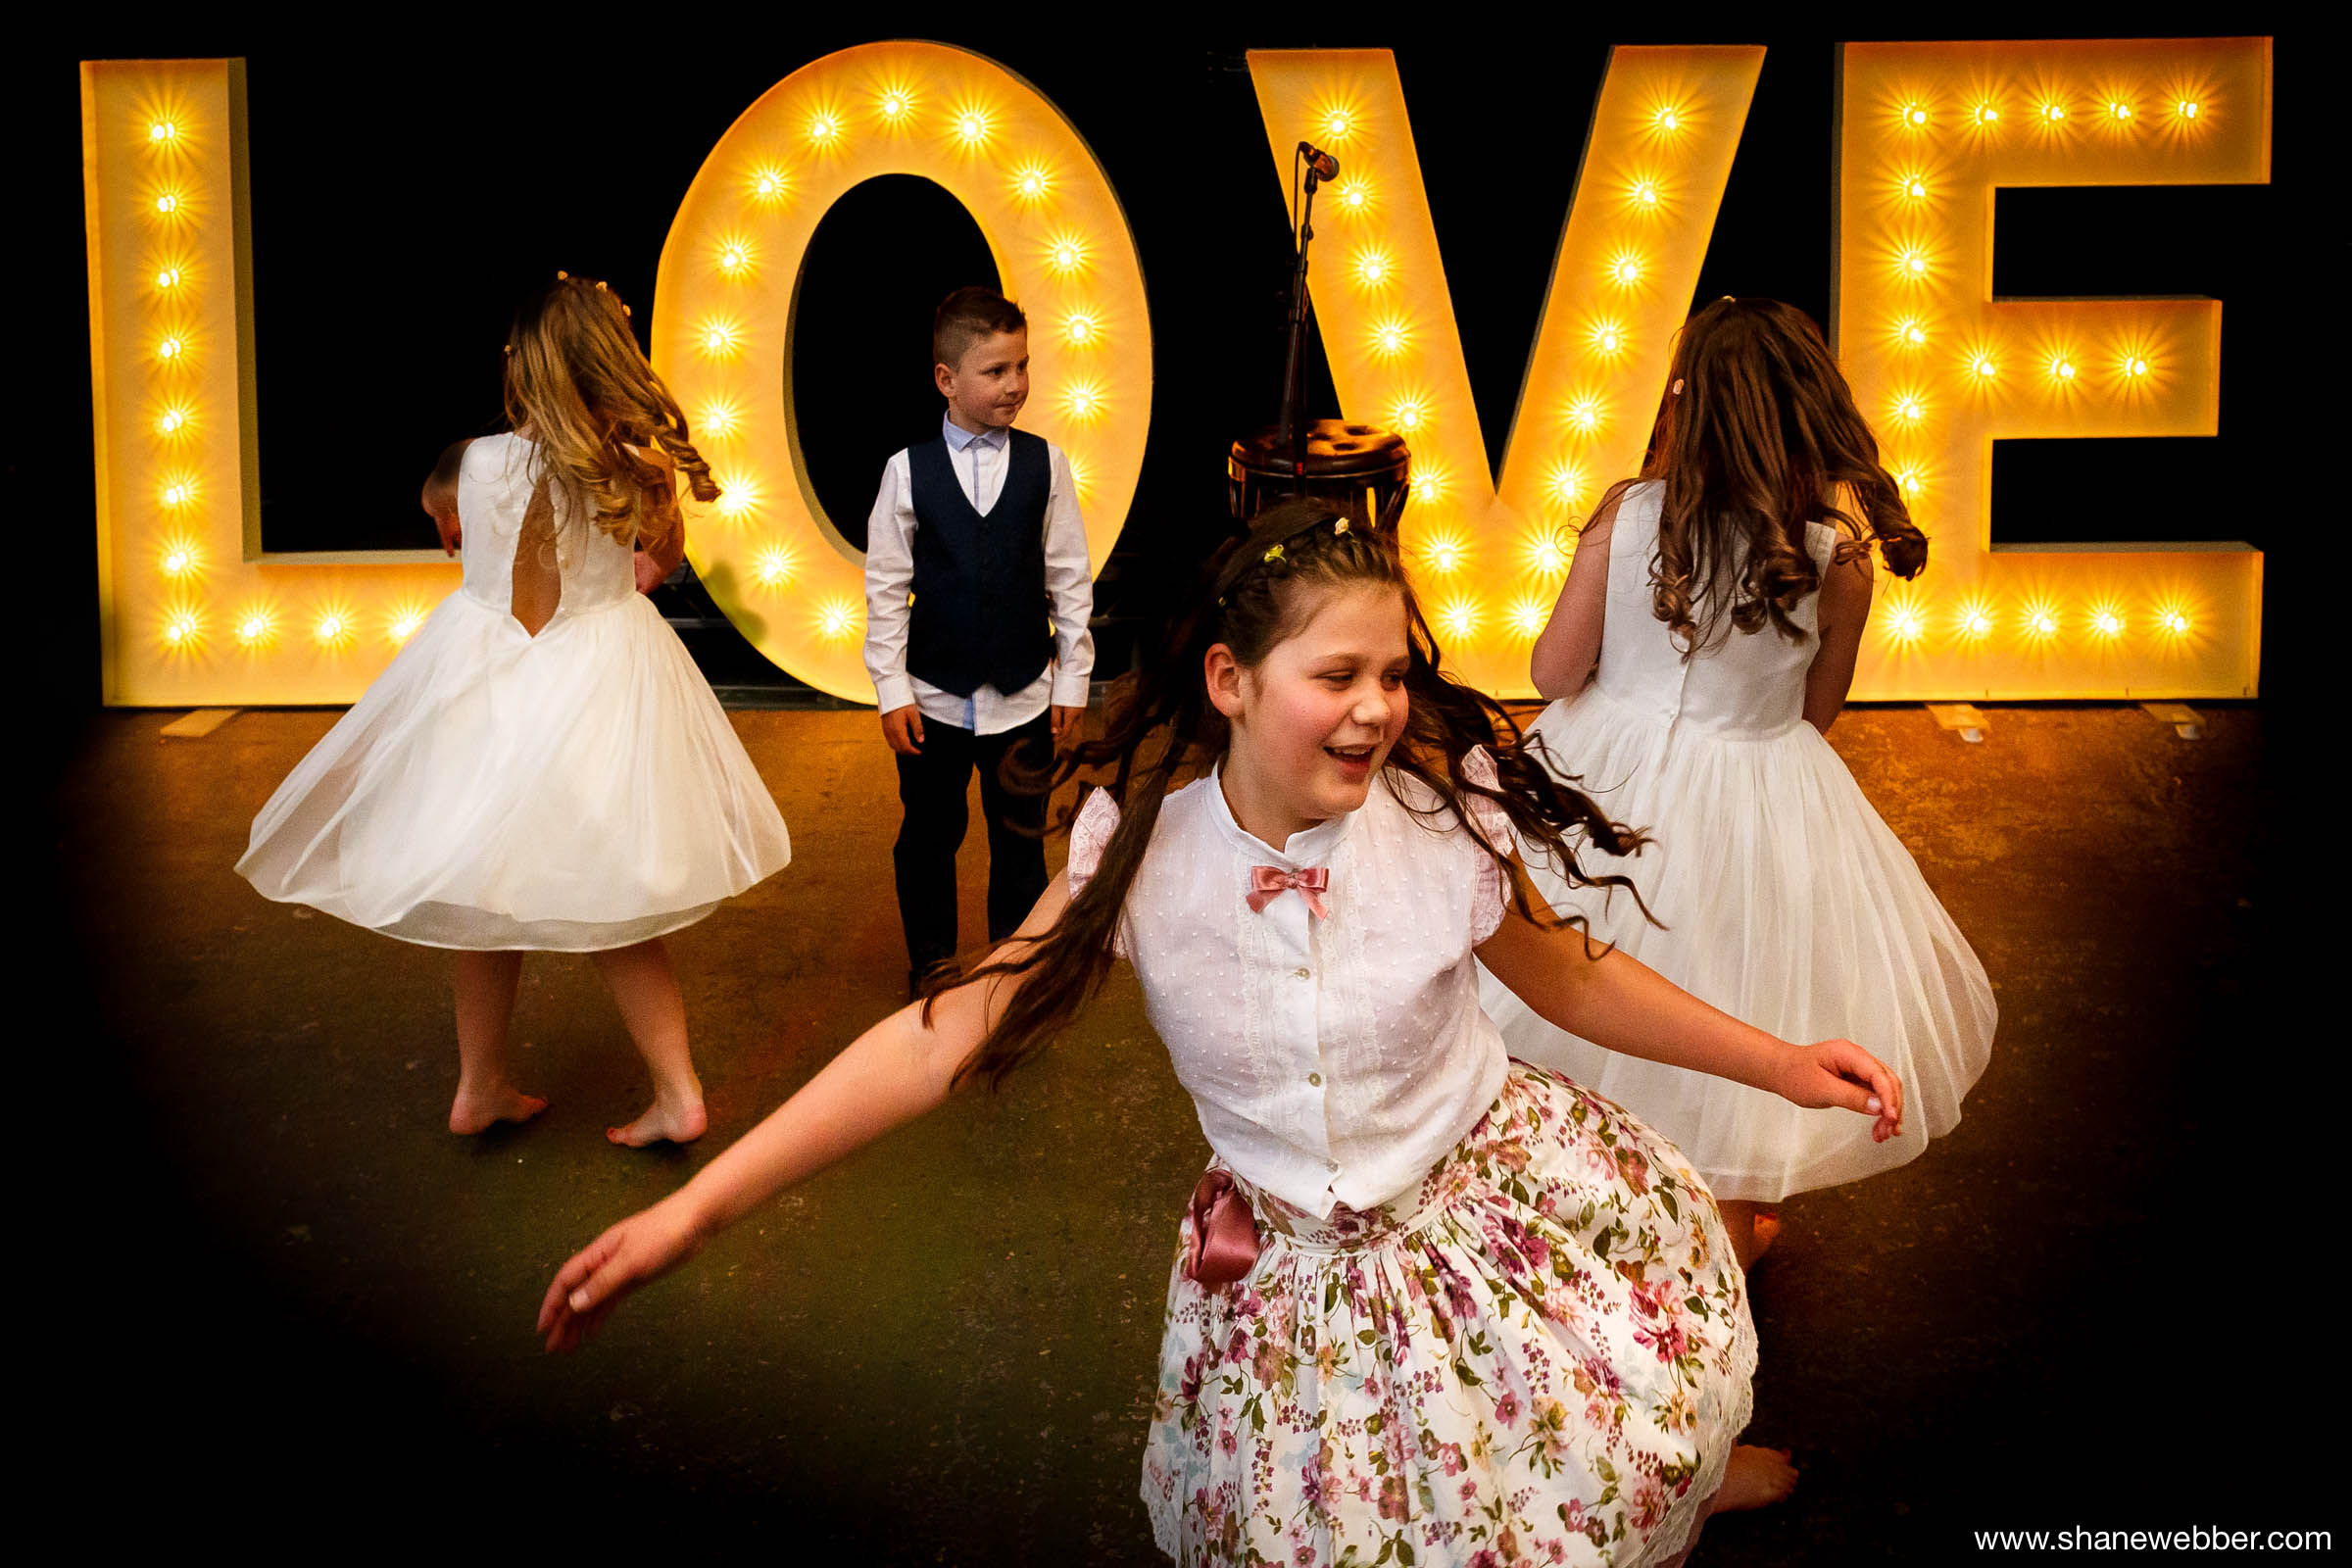 Best wedding photos of kids